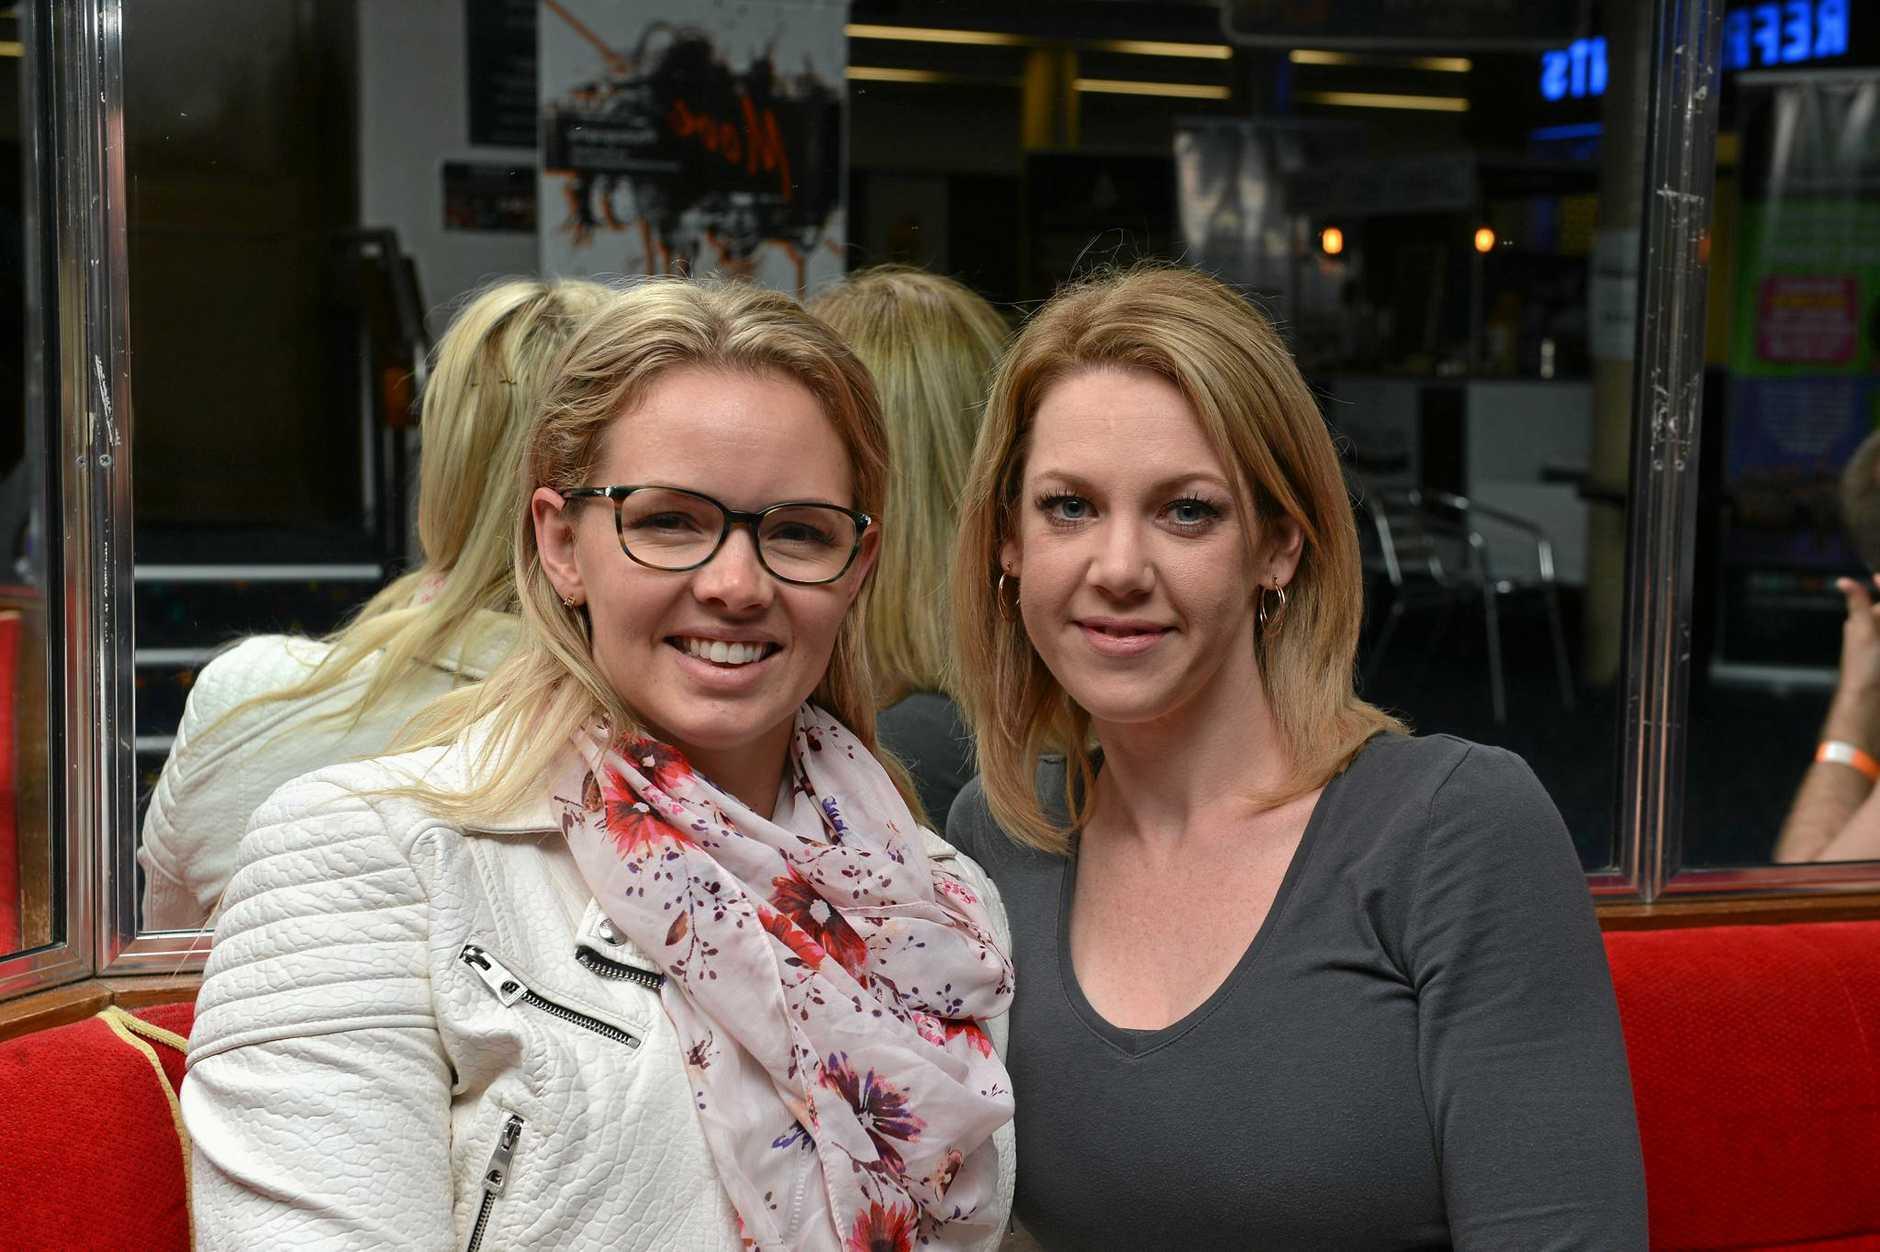 PREVIOUS DANCERS: Dance teachers Peta Jacobsen and Katie Griffiths return to the Bundaberg festival of Dance at the Moncrief Theatre.